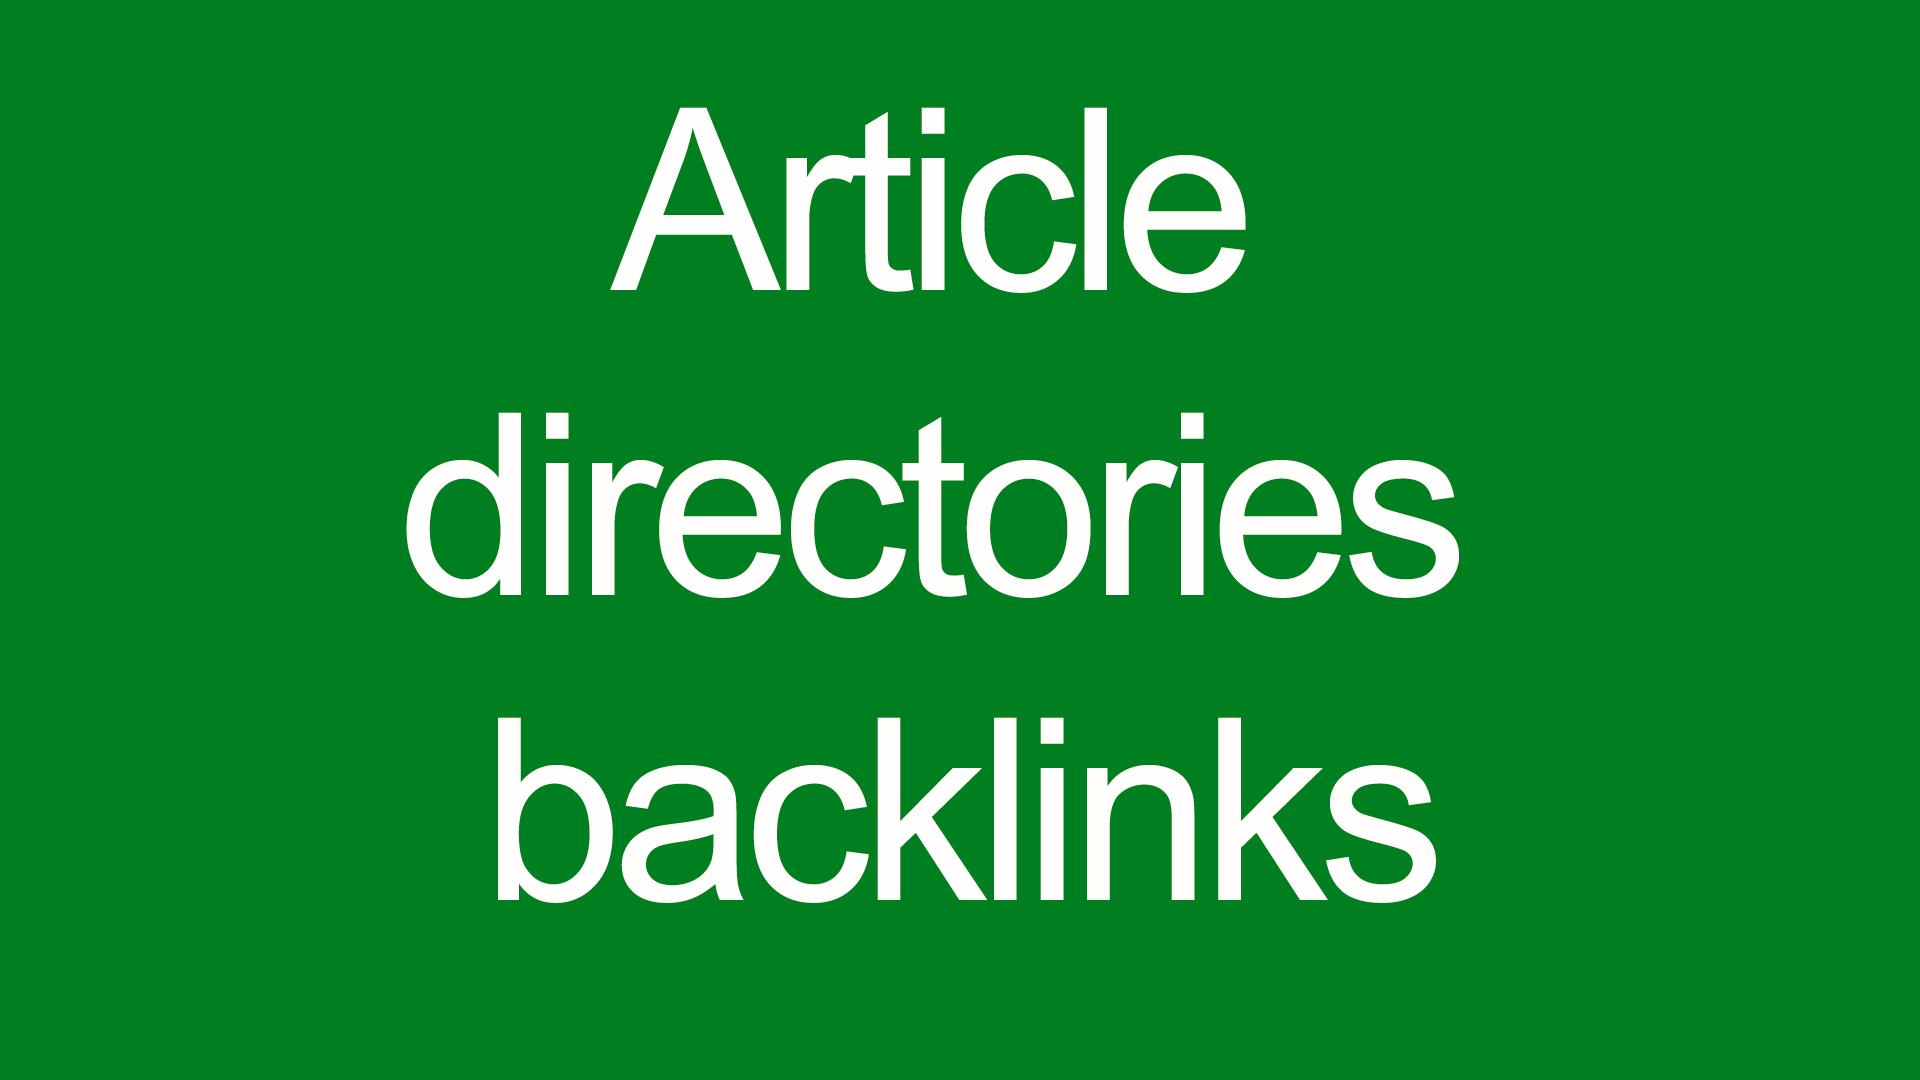 Article directories backlinks contextual backlinks 2000 backlinks